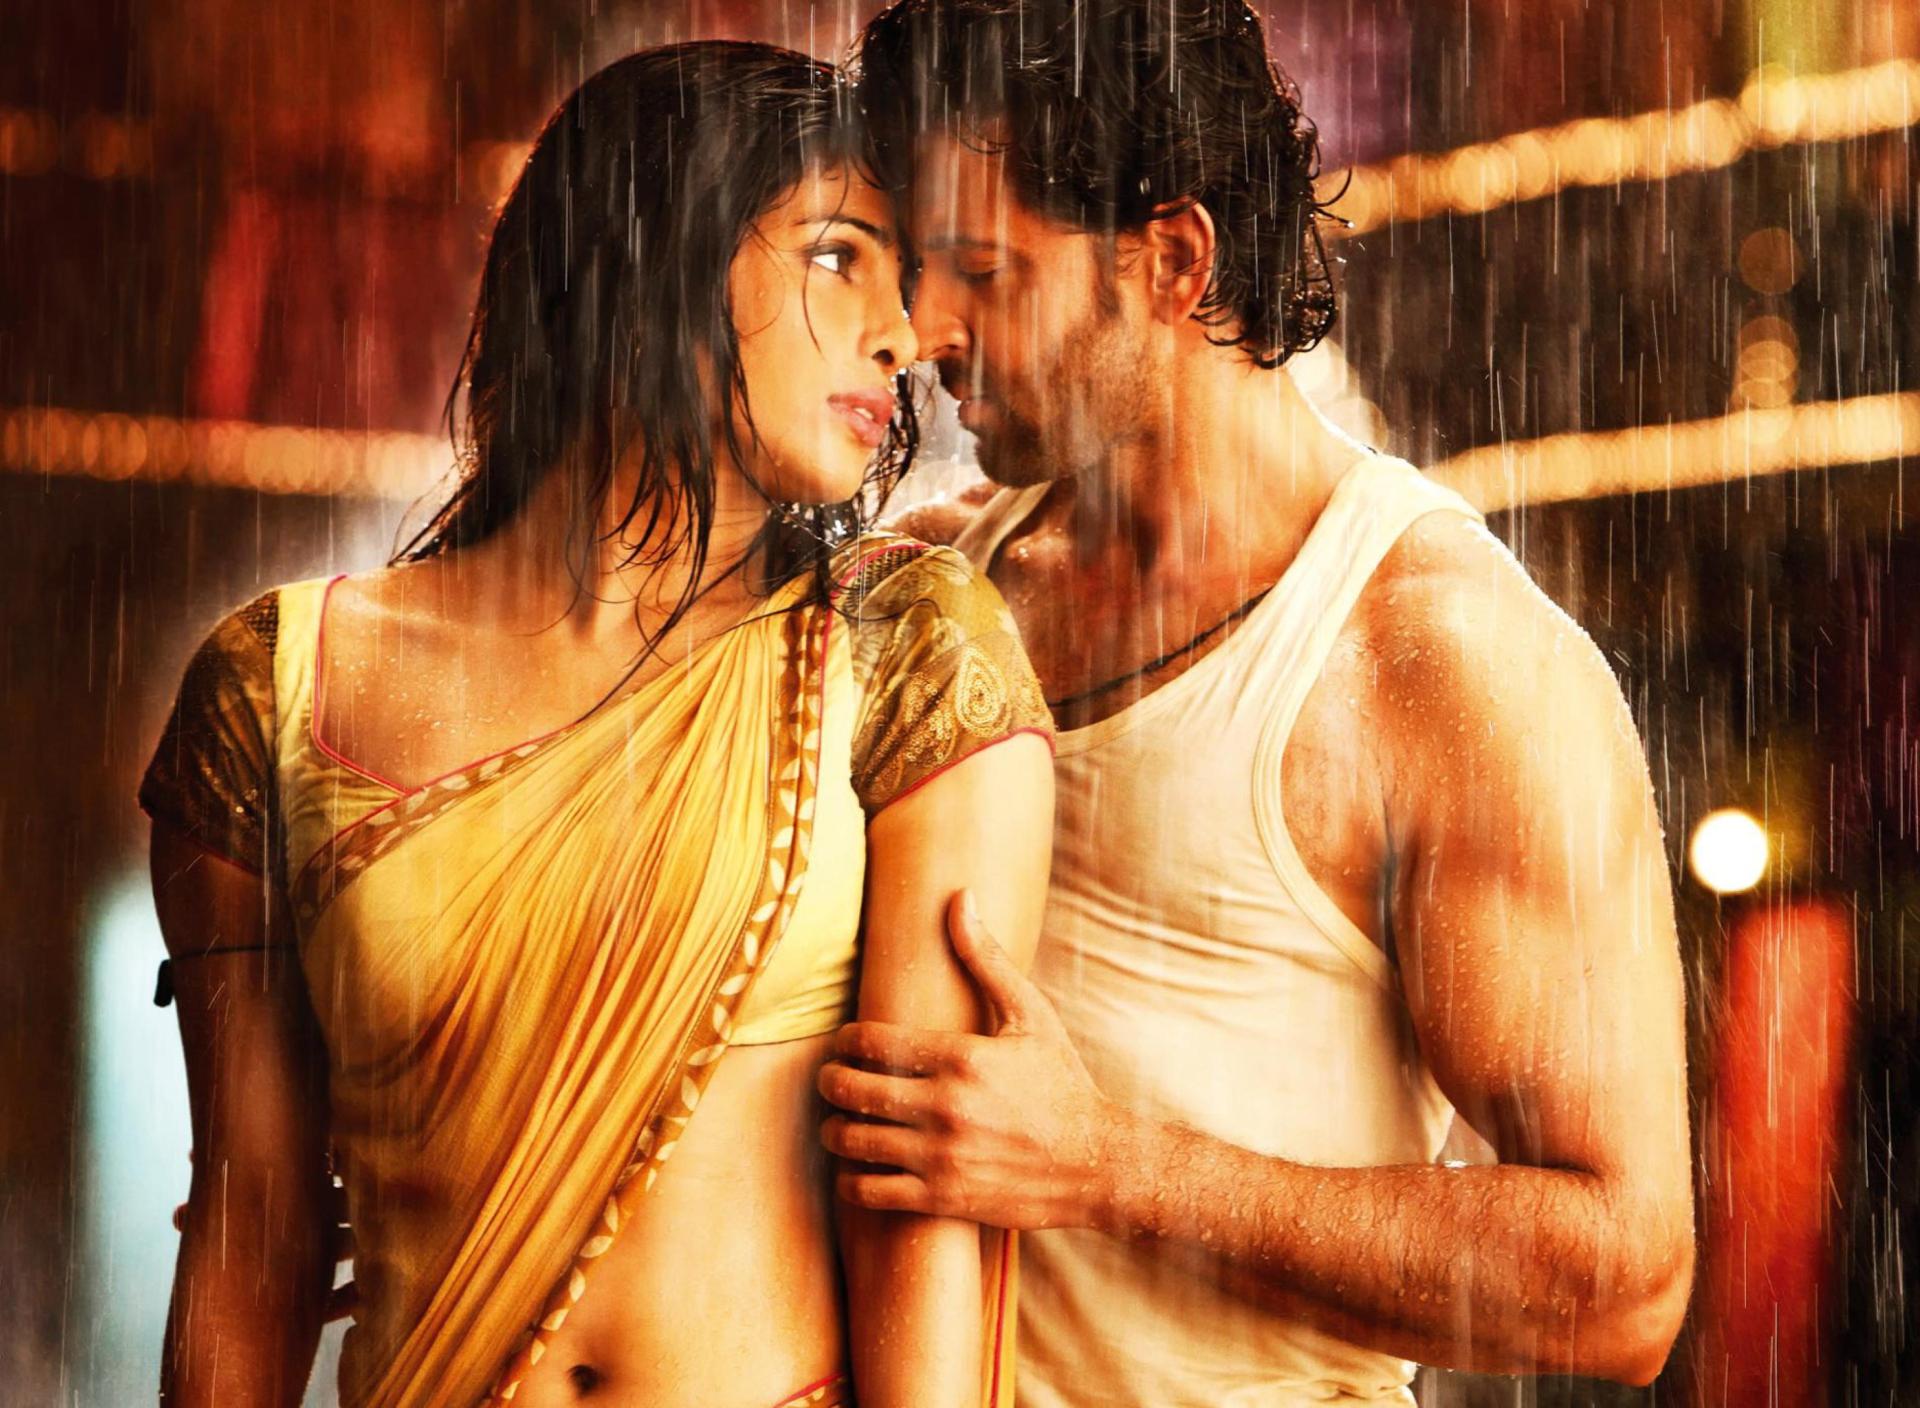 indiyskiy-porno-filmi